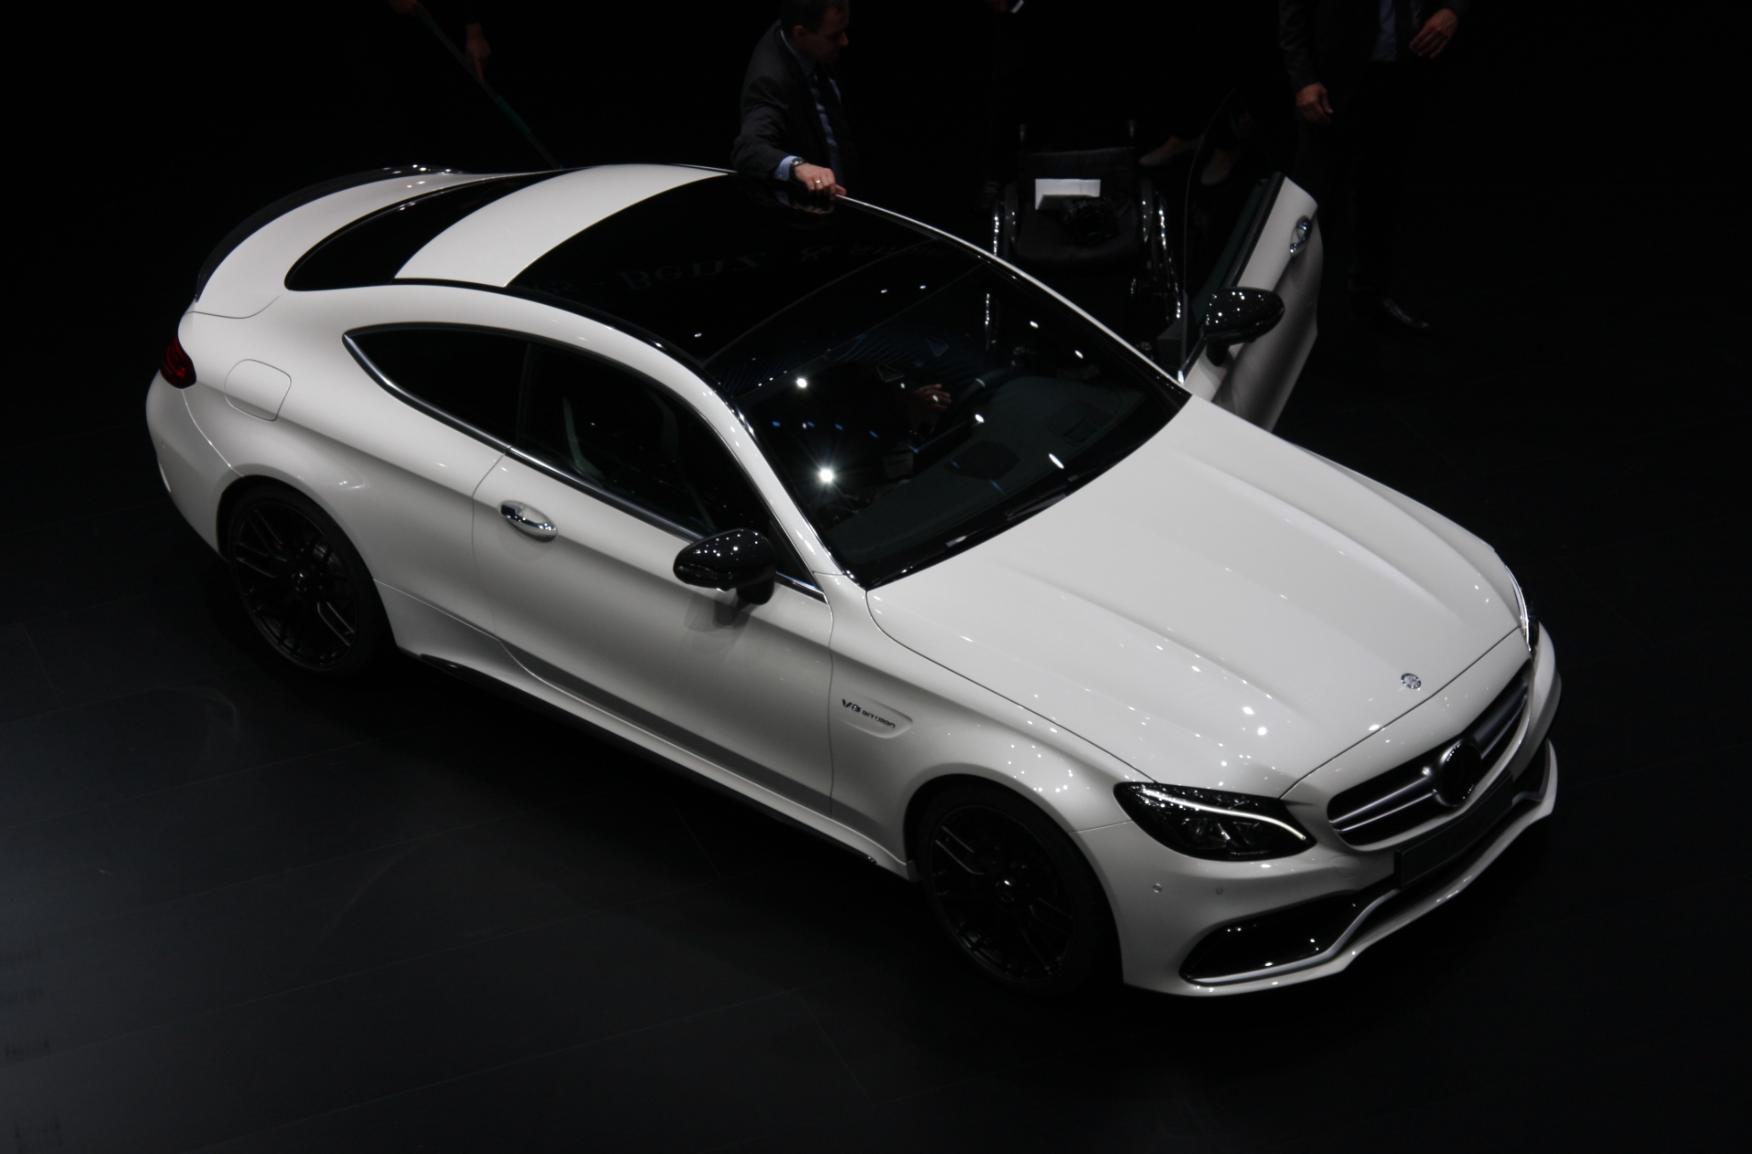 2017 mercedes amg c63 coupe 2015 frankfurt auto show live for Mercedes benz raffle 2017